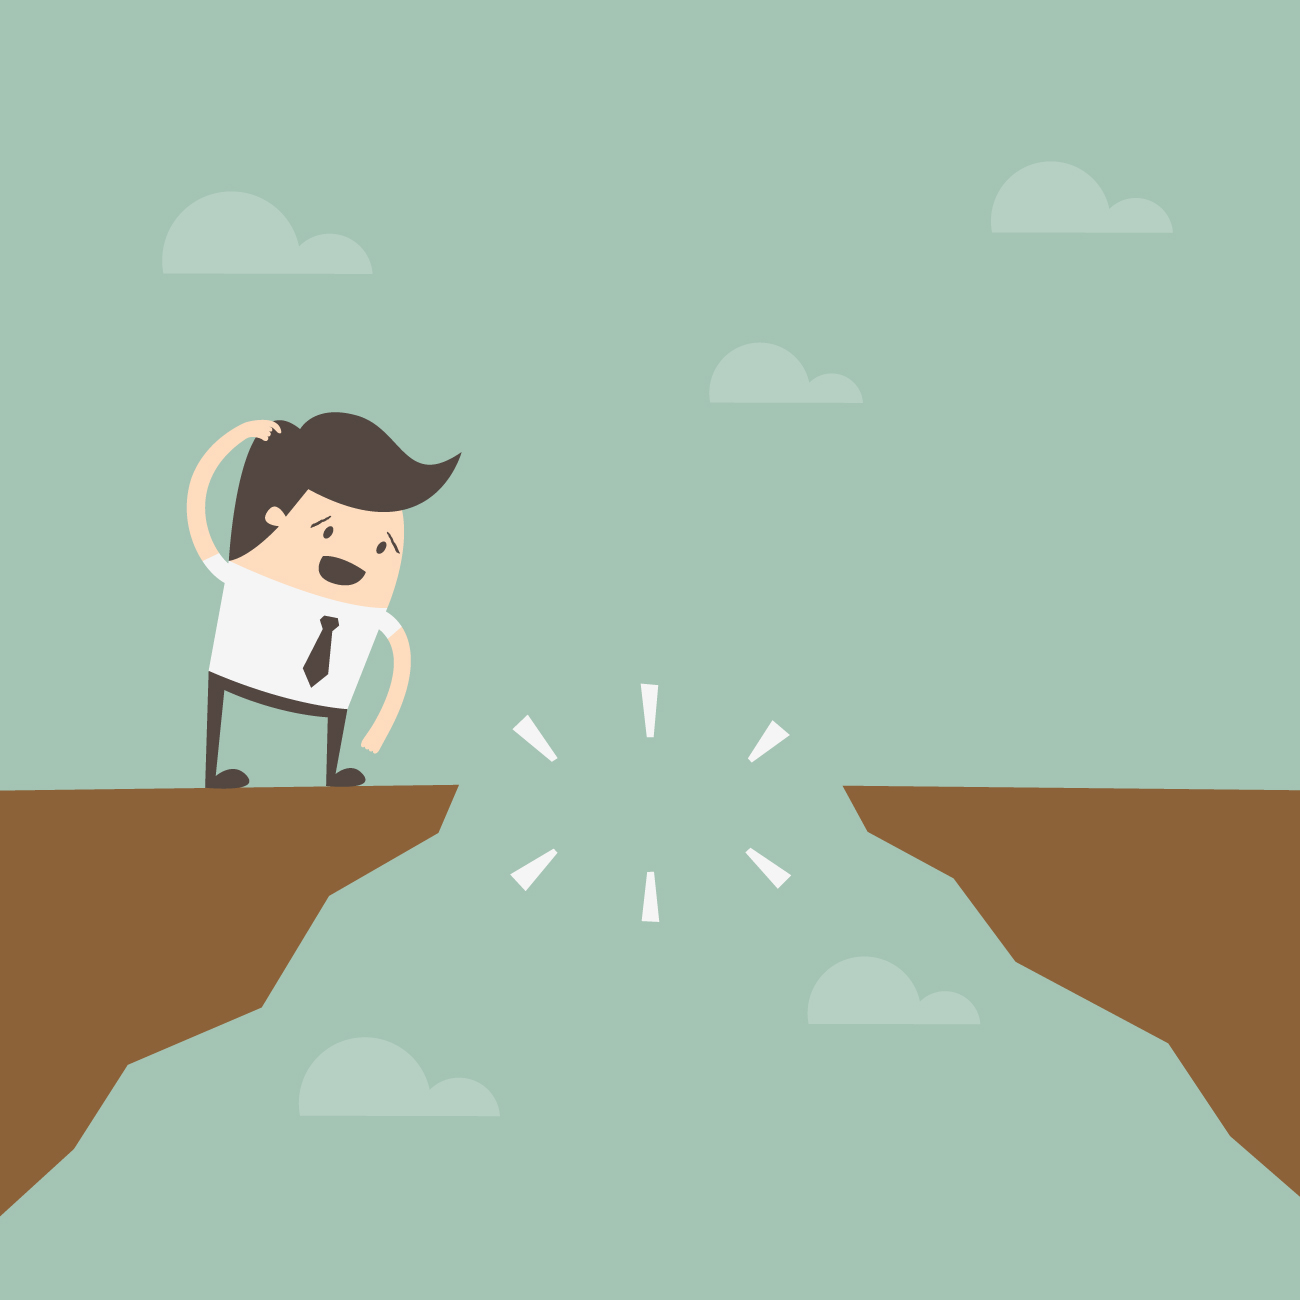 ahg-asx-automotive holdings-risk-fall-trip-down-drop-cliff-hazard-risk